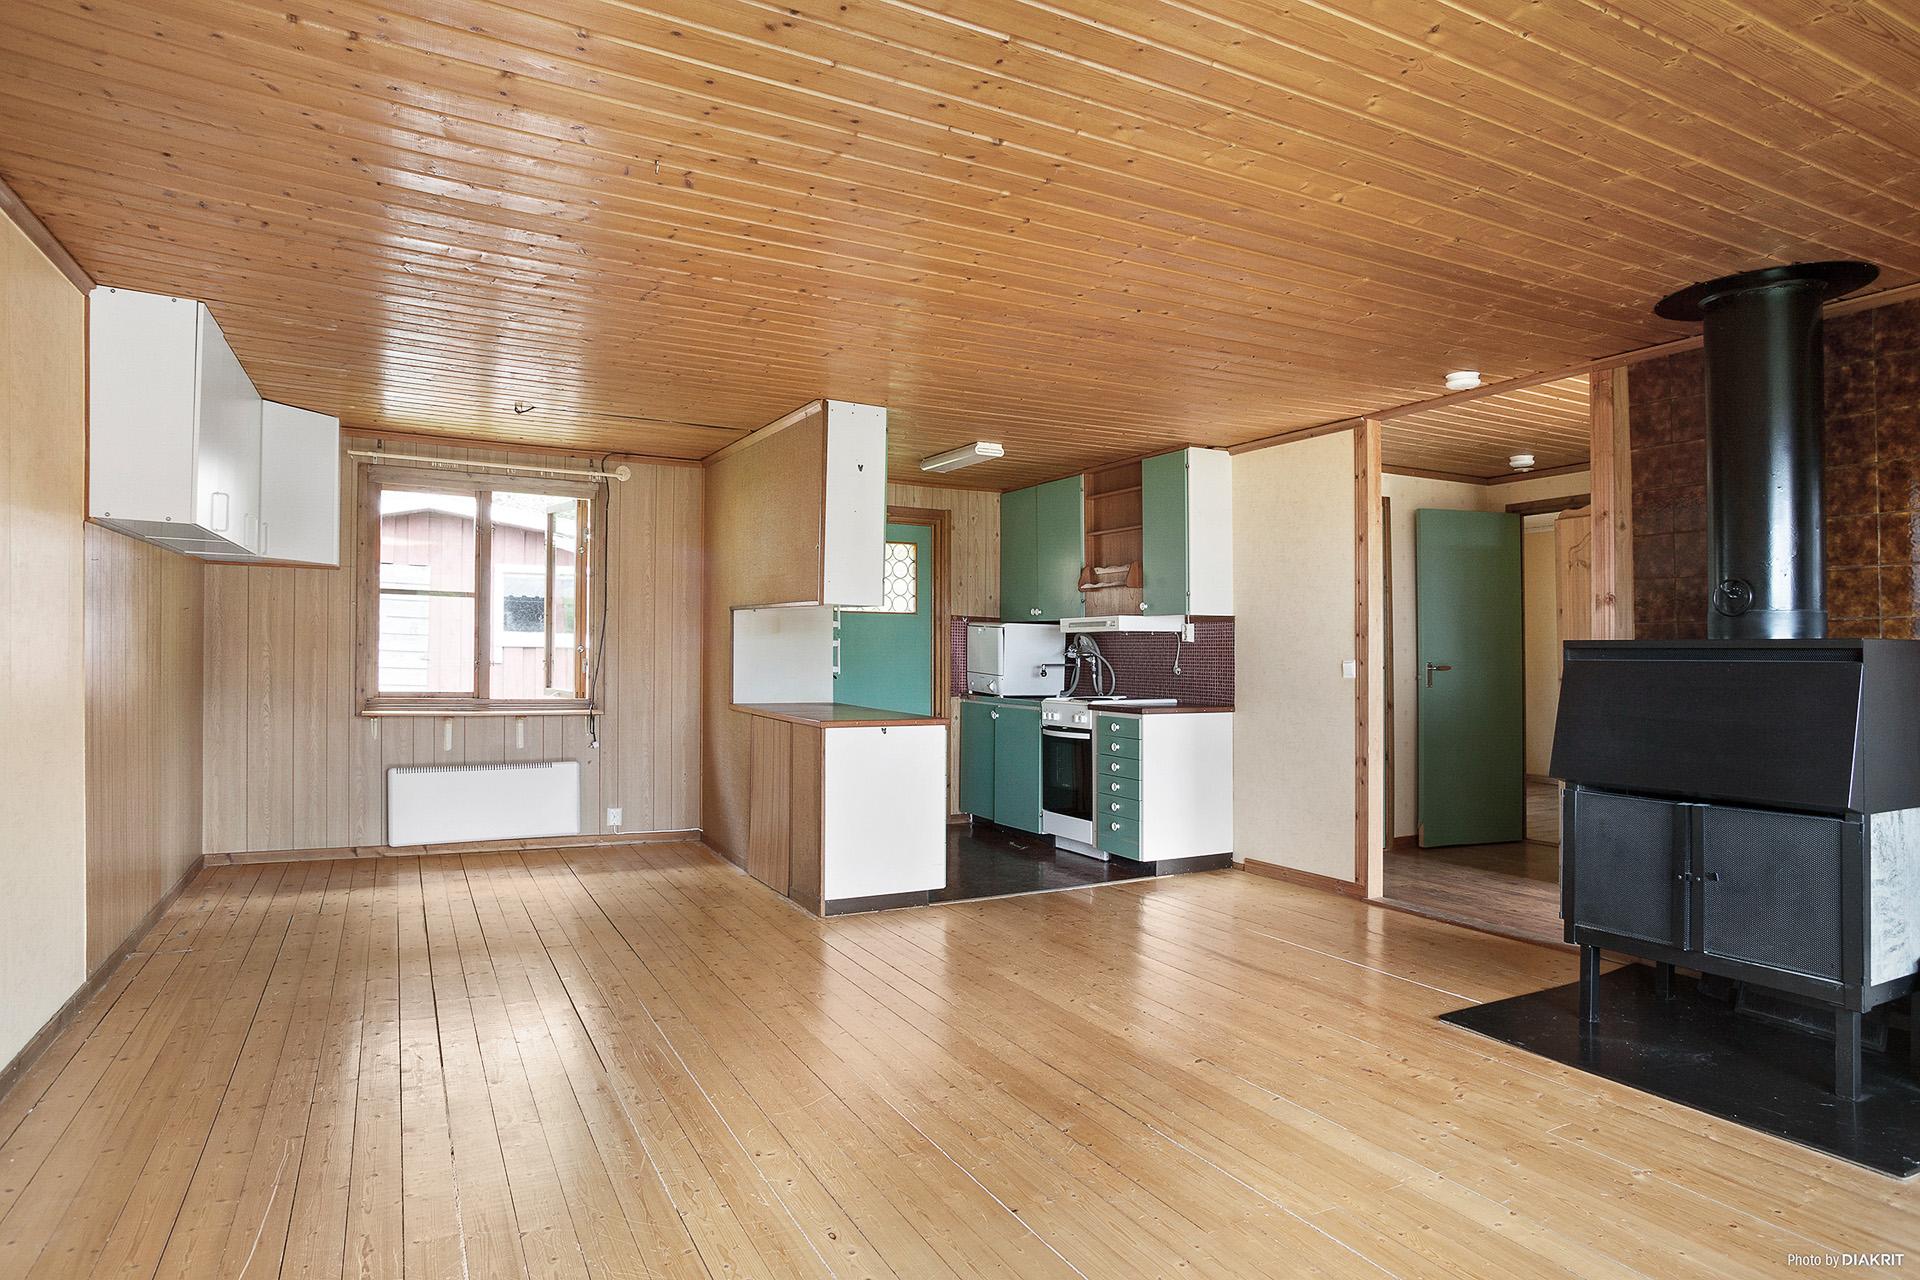 Vardagsrum med köksdel